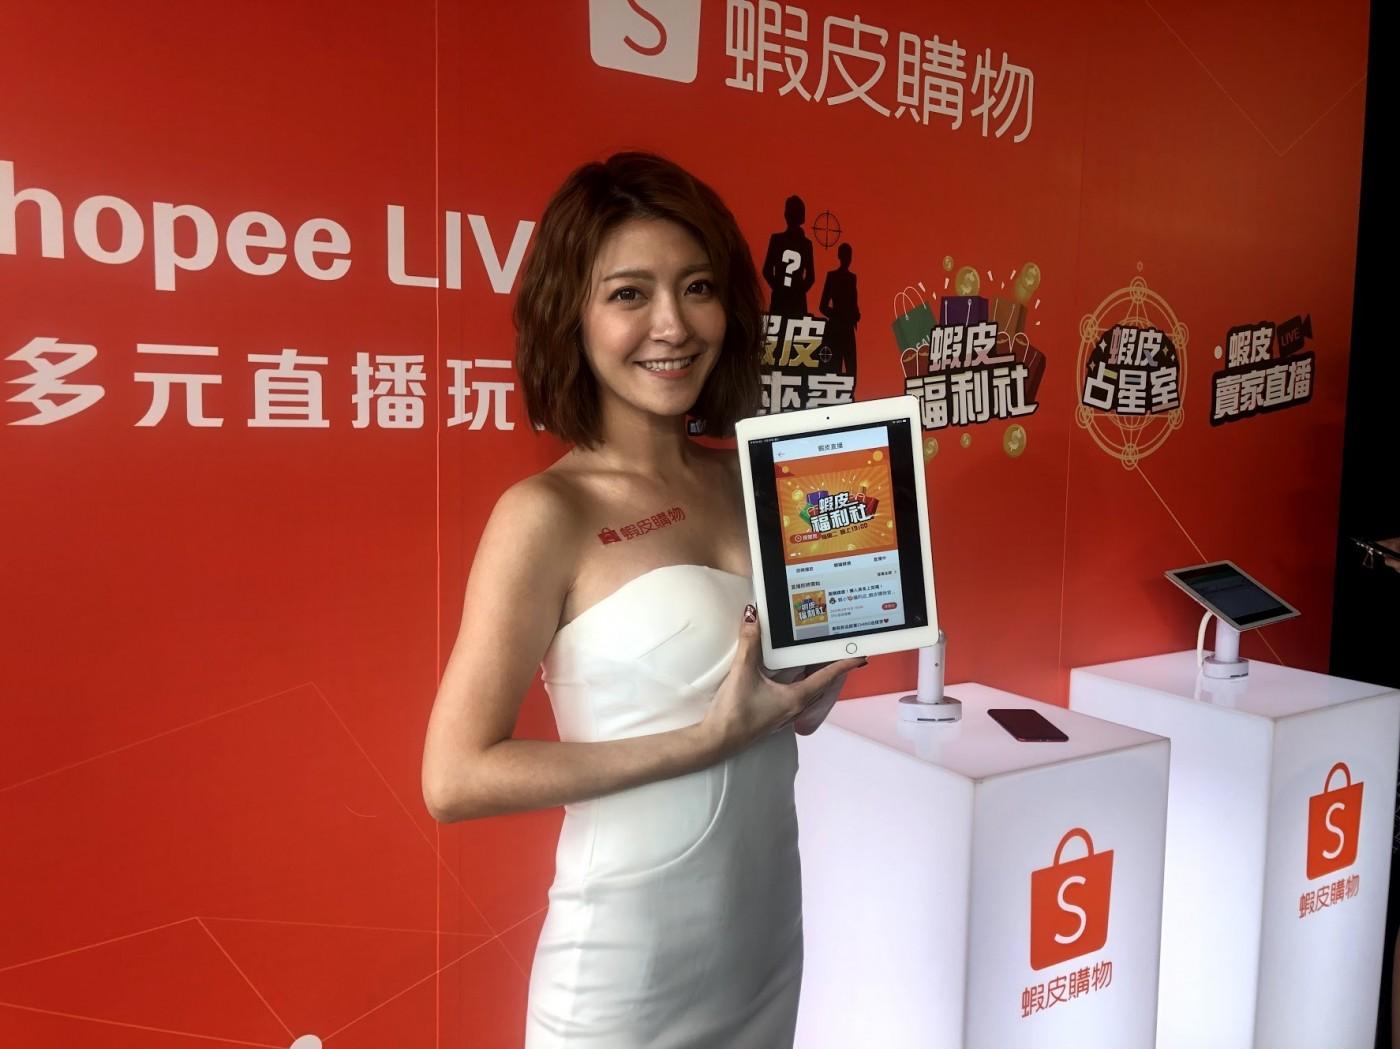 Shopee LIVE正式上線,蝦皮推直播轉型新媒體平台